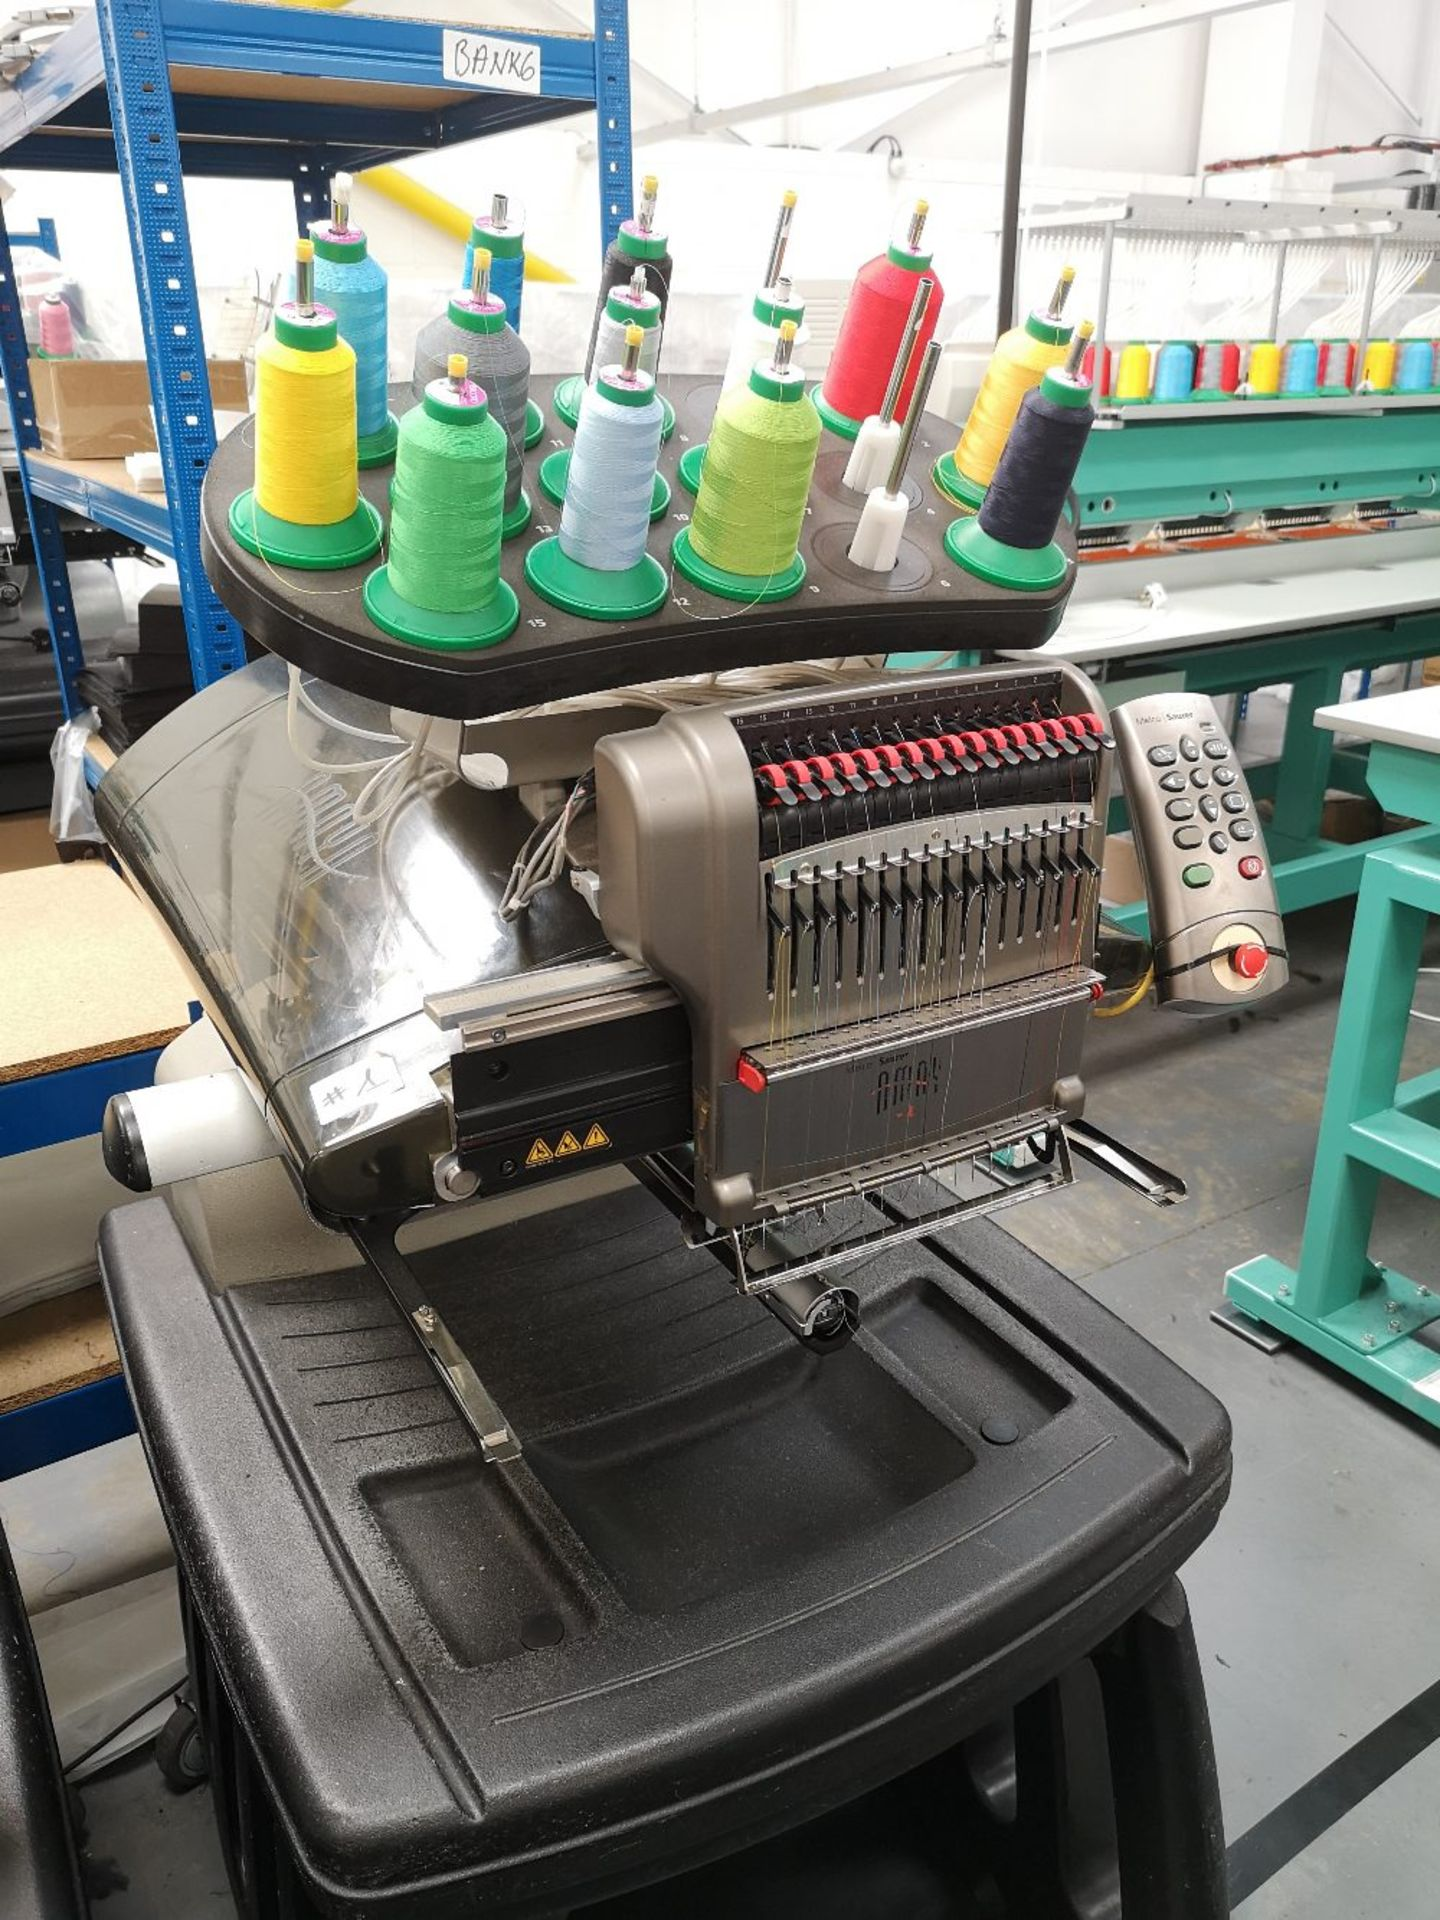 MELCO Amaya Embroidery Machine XT PN 3000007